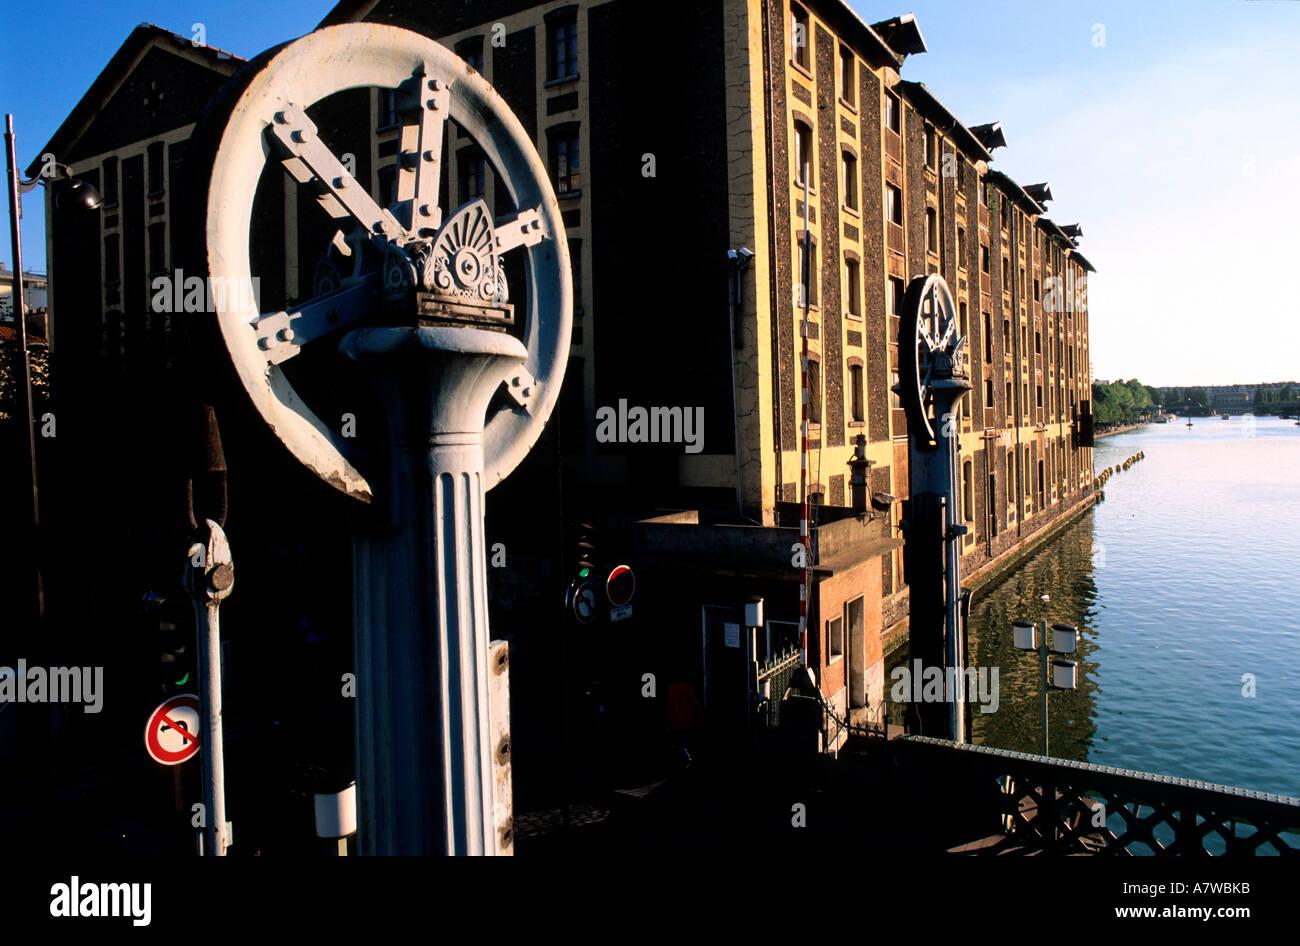 France, Paris, drawbridge spanning the Ourcq canal - Stock Image